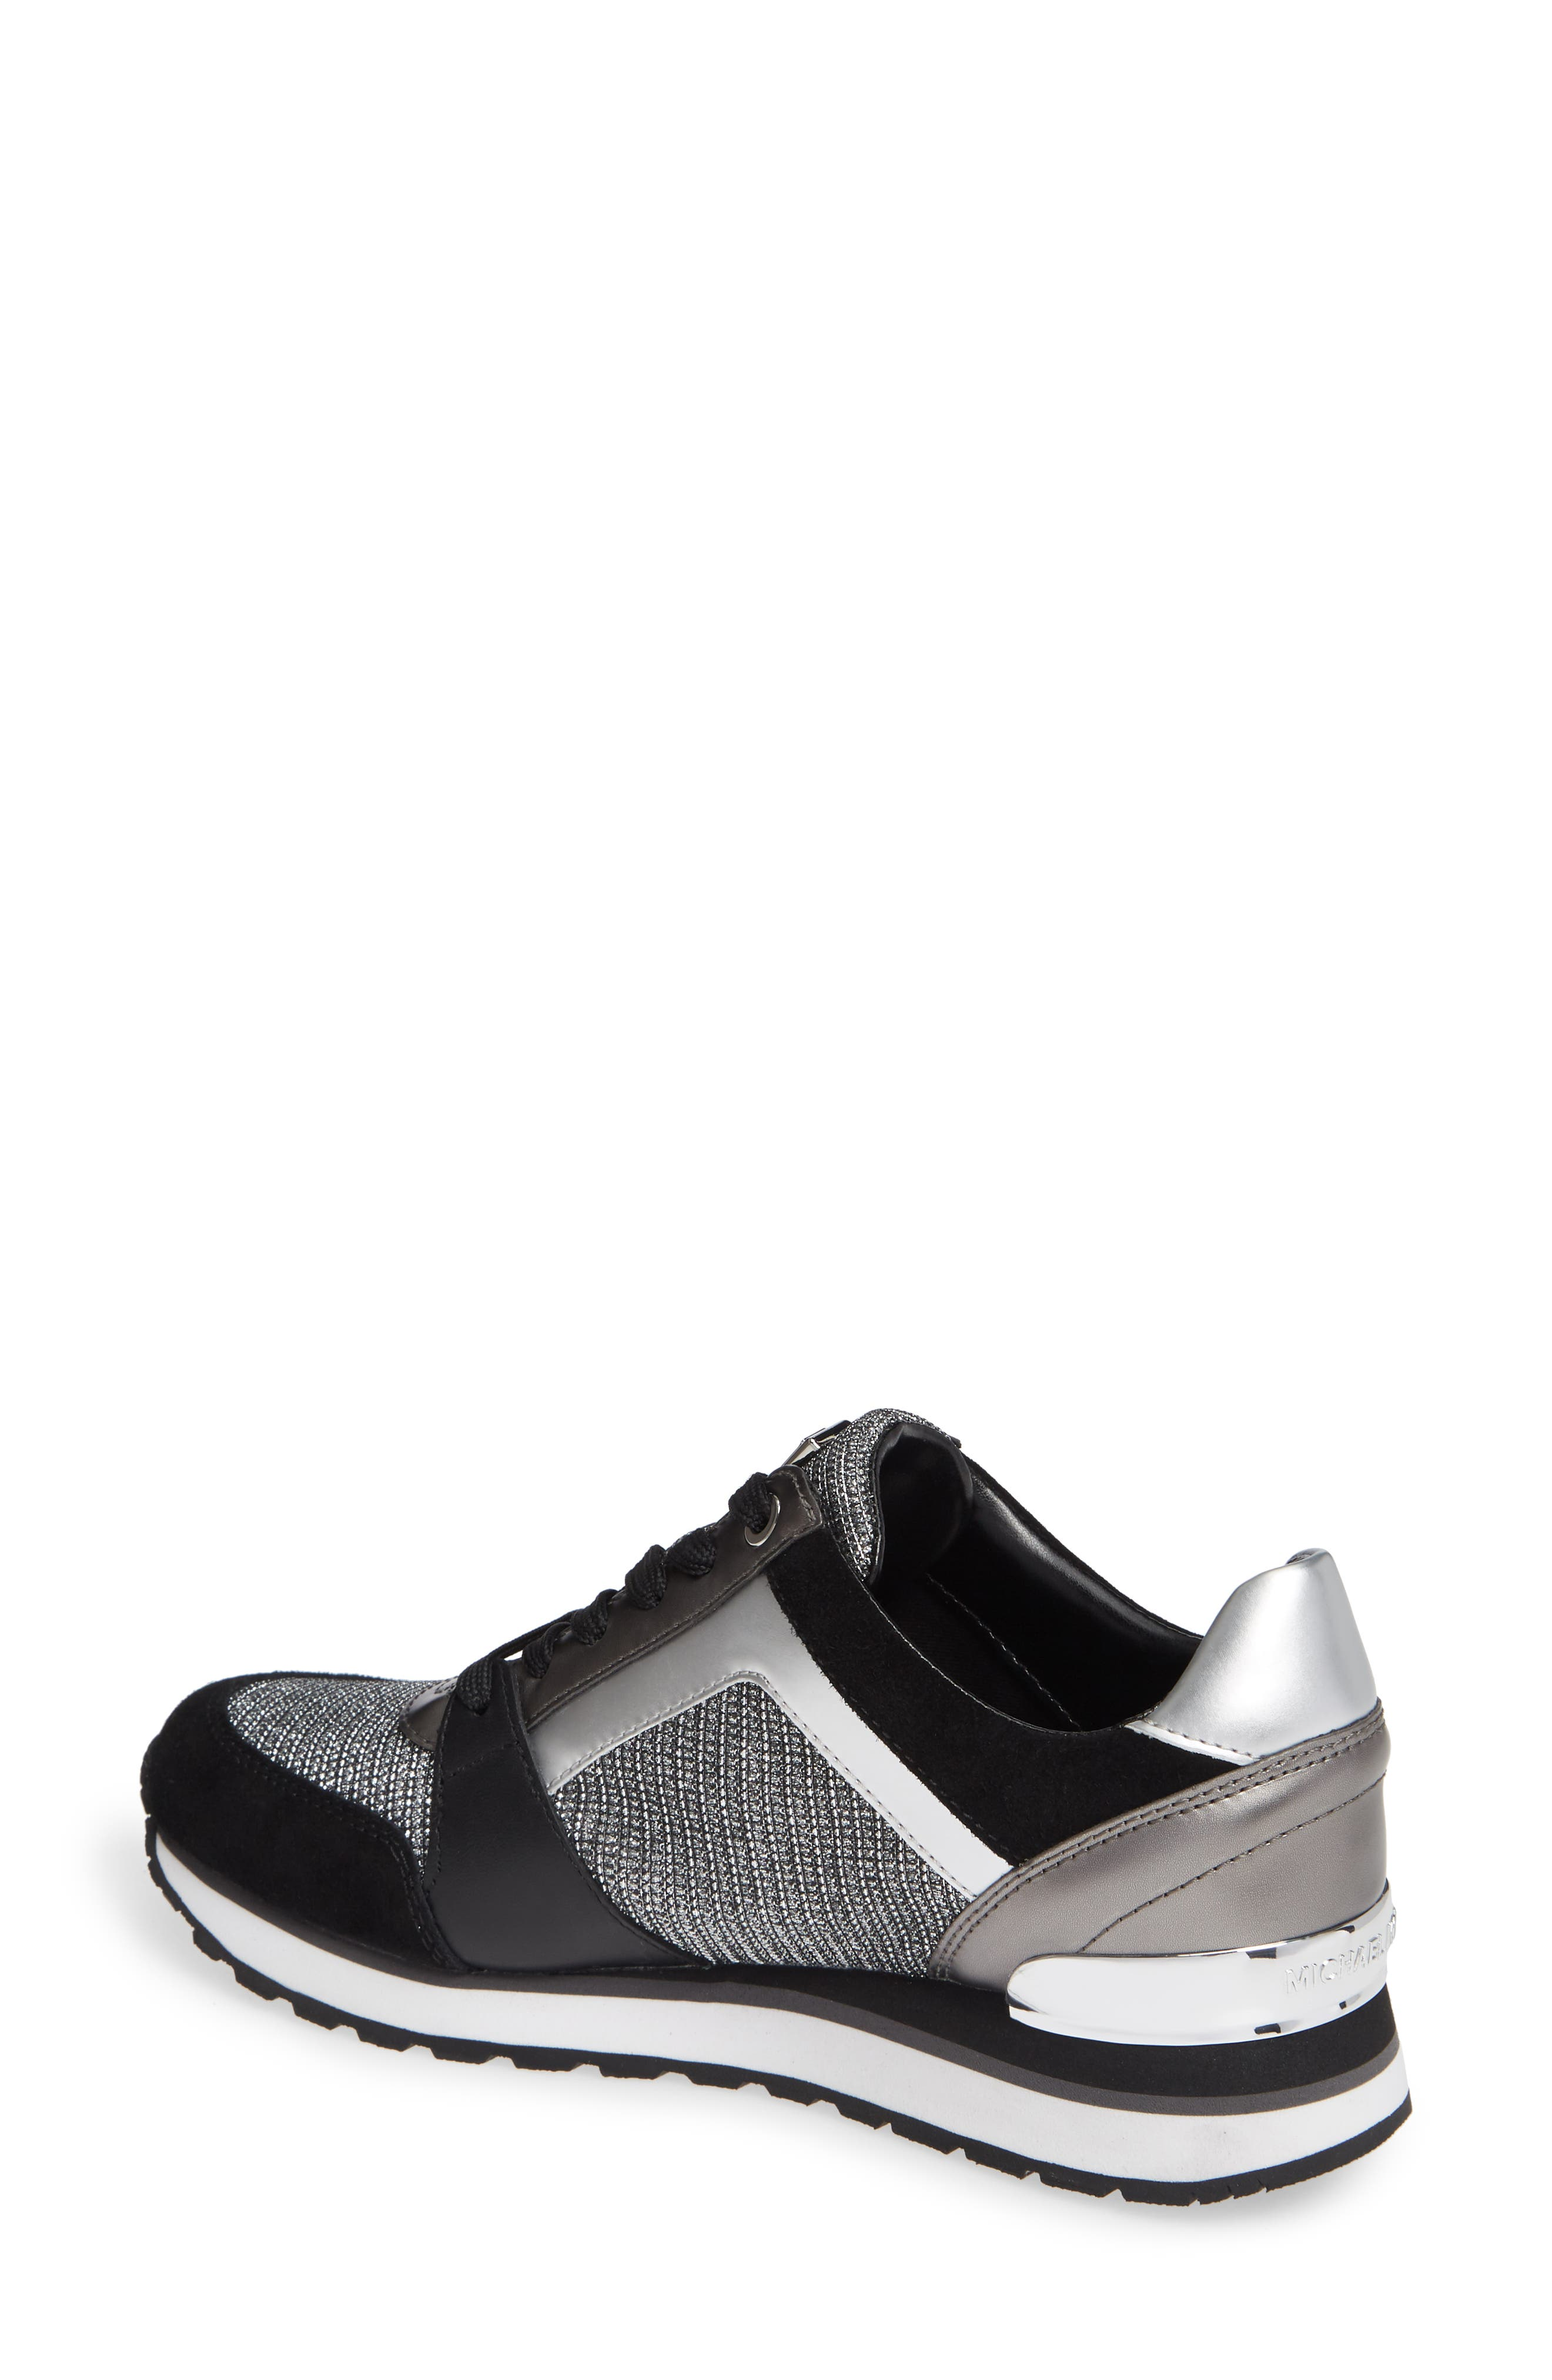 Billie Perforated Sneaker,                             Alternate thumbnail 2, color,                             BLACK/ SILVER